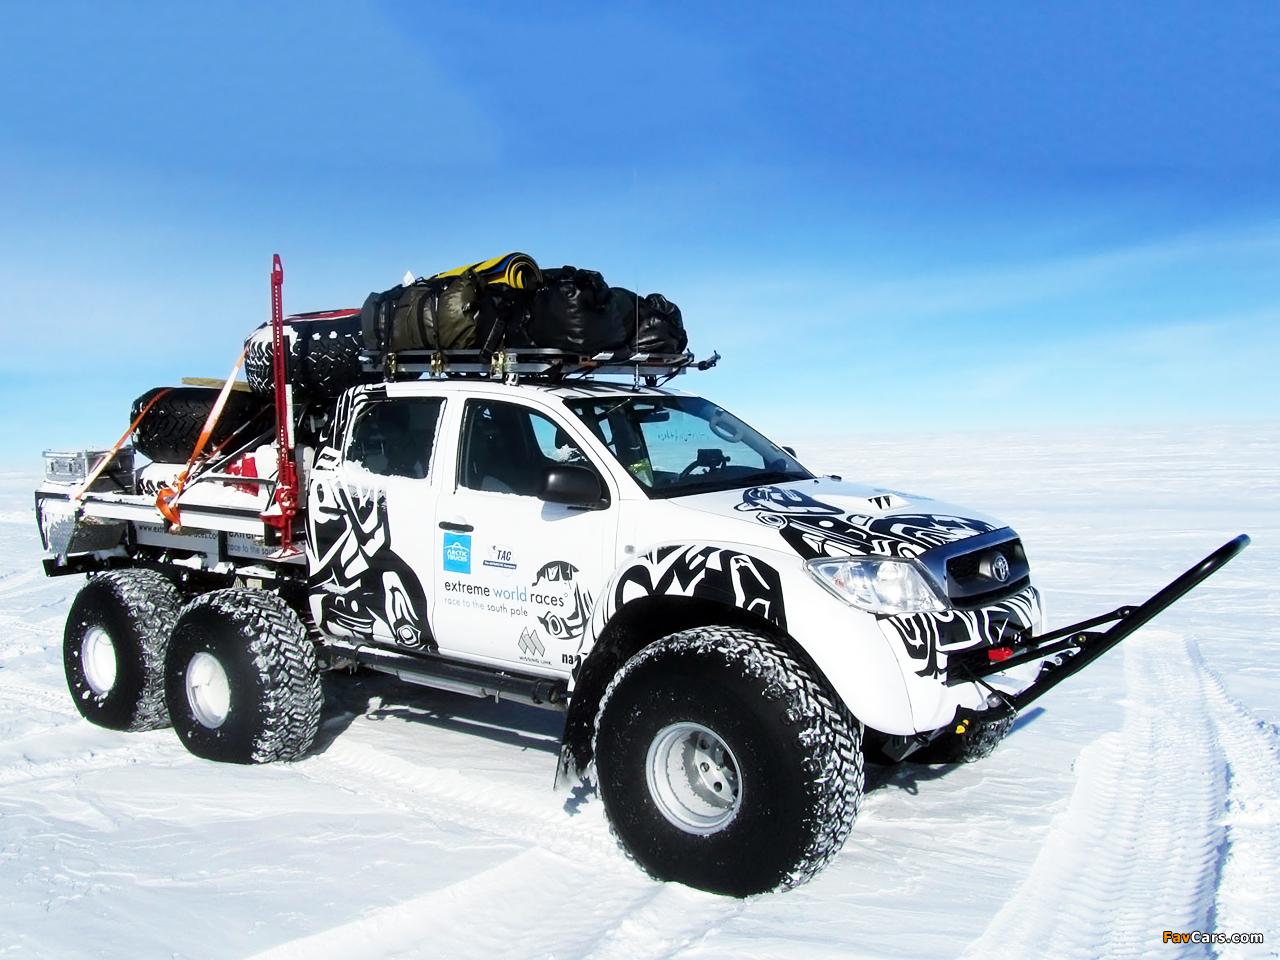 Arctic Trucks Toyota Hilux AT44 6x6 2010 wallpapers 1280 x 960 1280x960